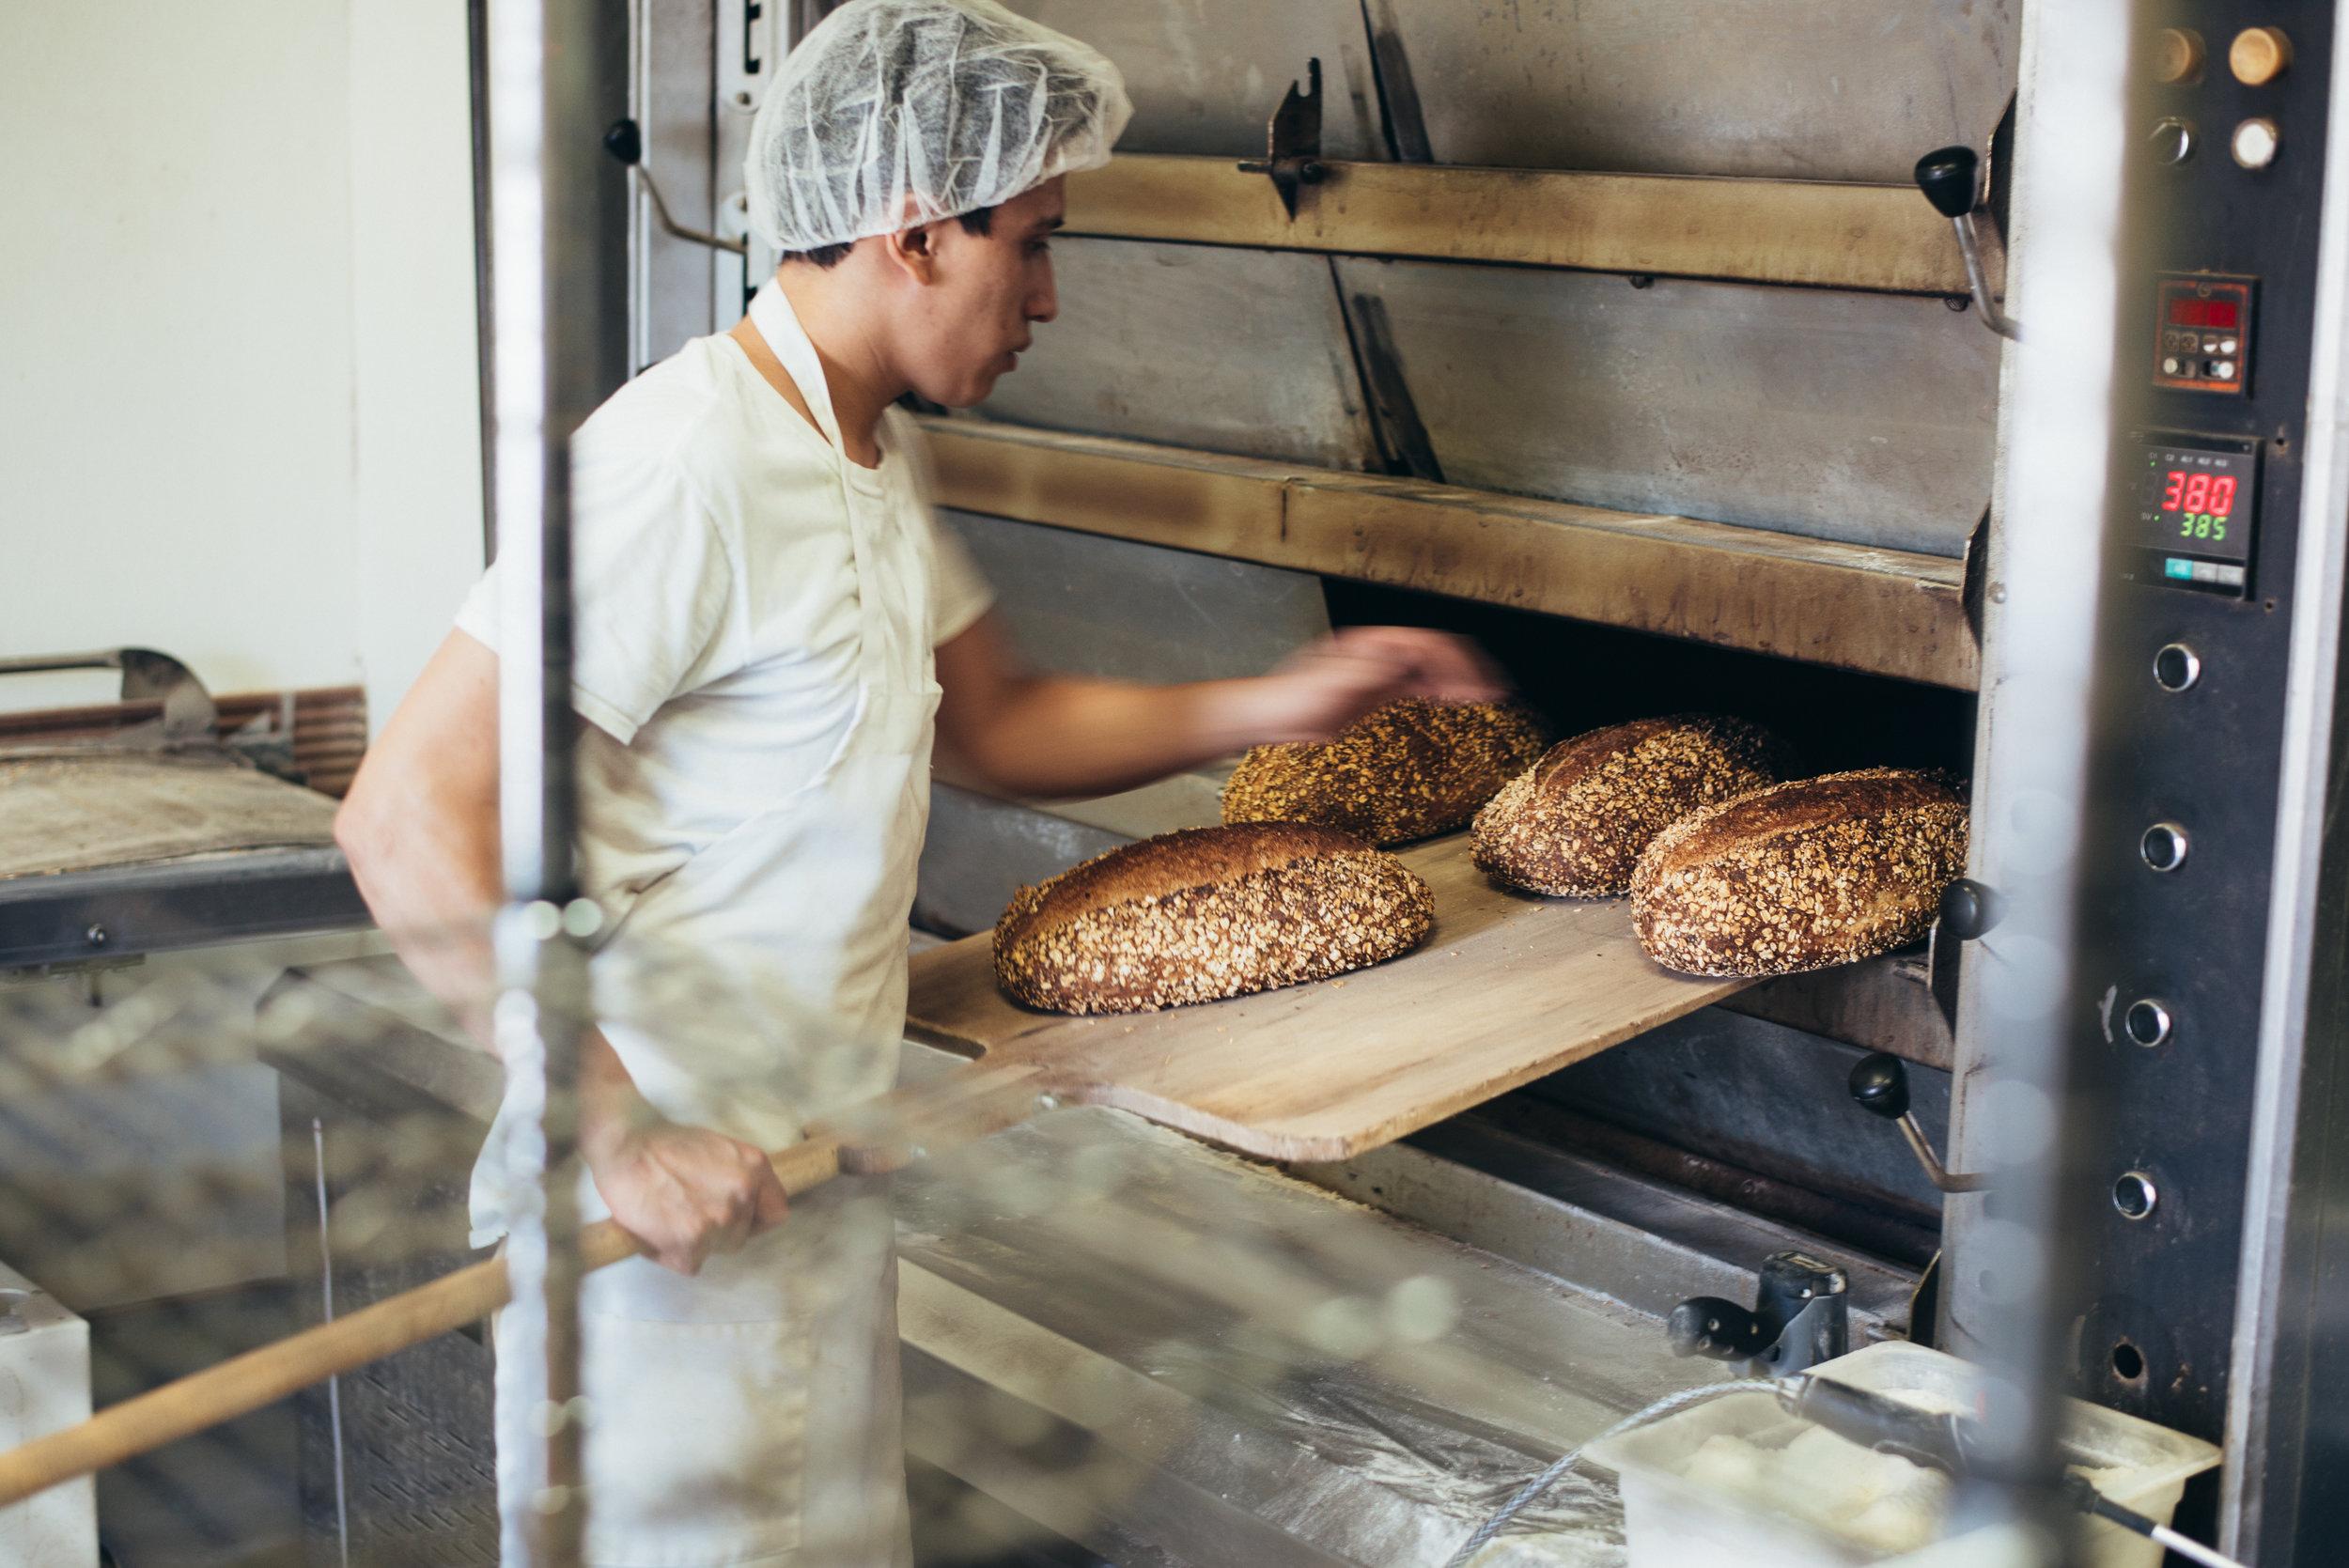 Bread_Artisan_Bakery_75-6498.jpg